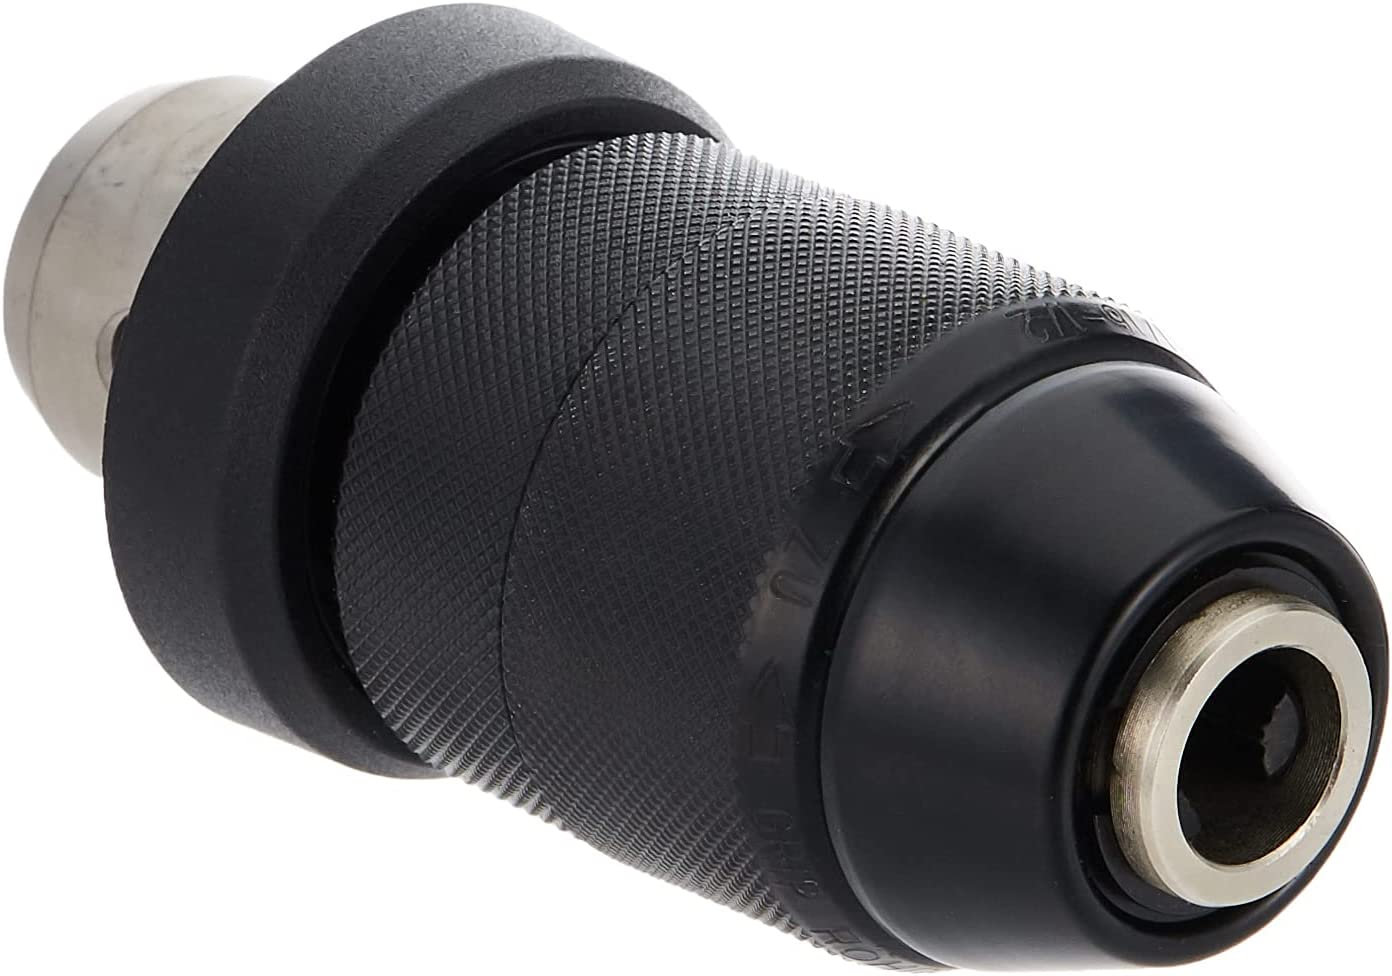 New KEYLESS Quick Drill Chuck For Bosch GBH 2-26 DFR Adapter